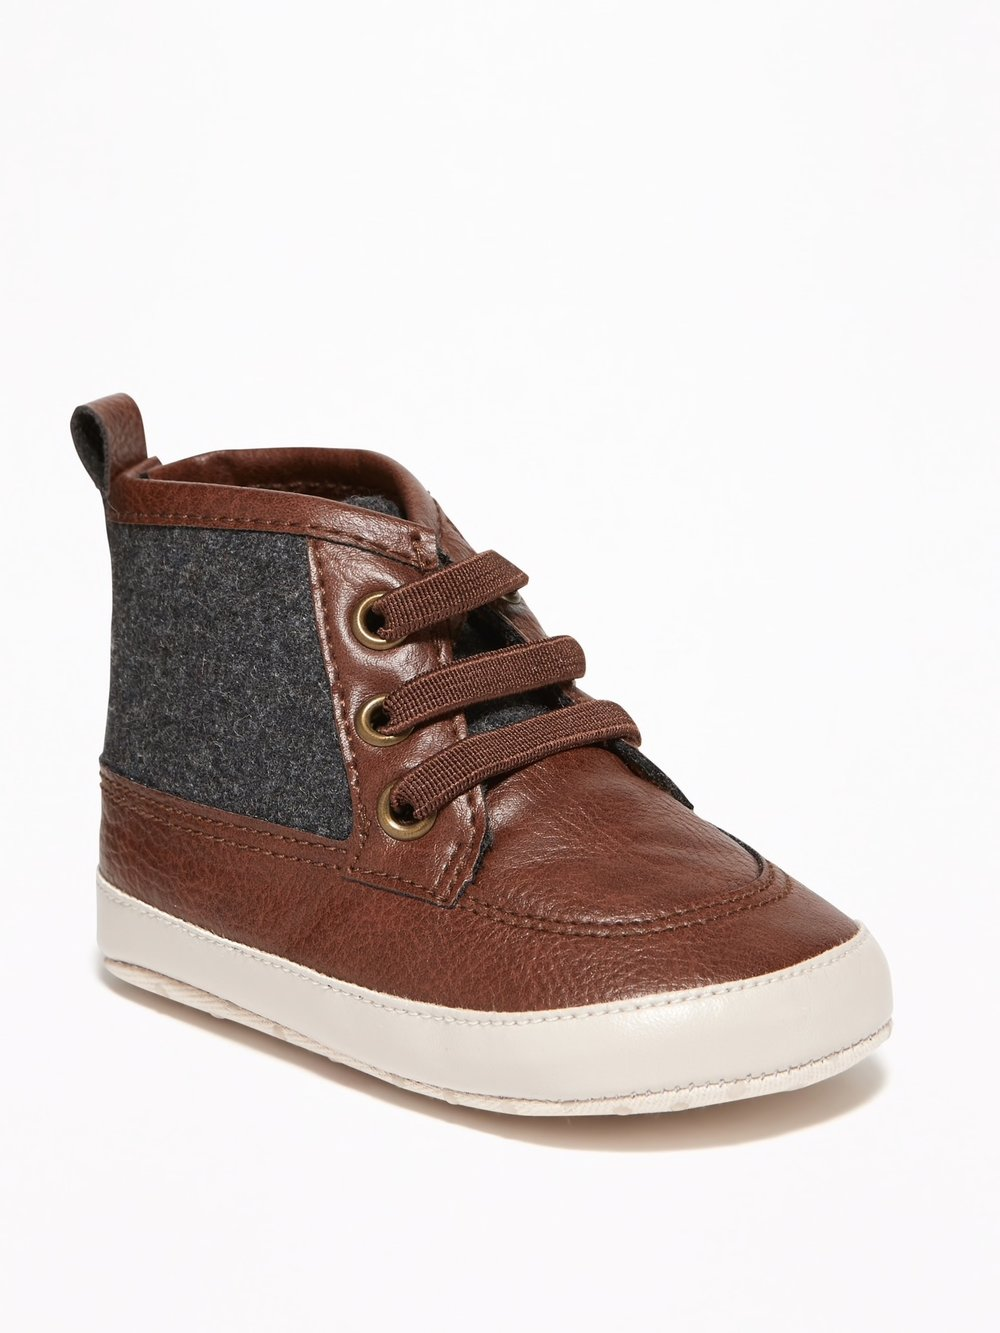 baby boy boots.jpg